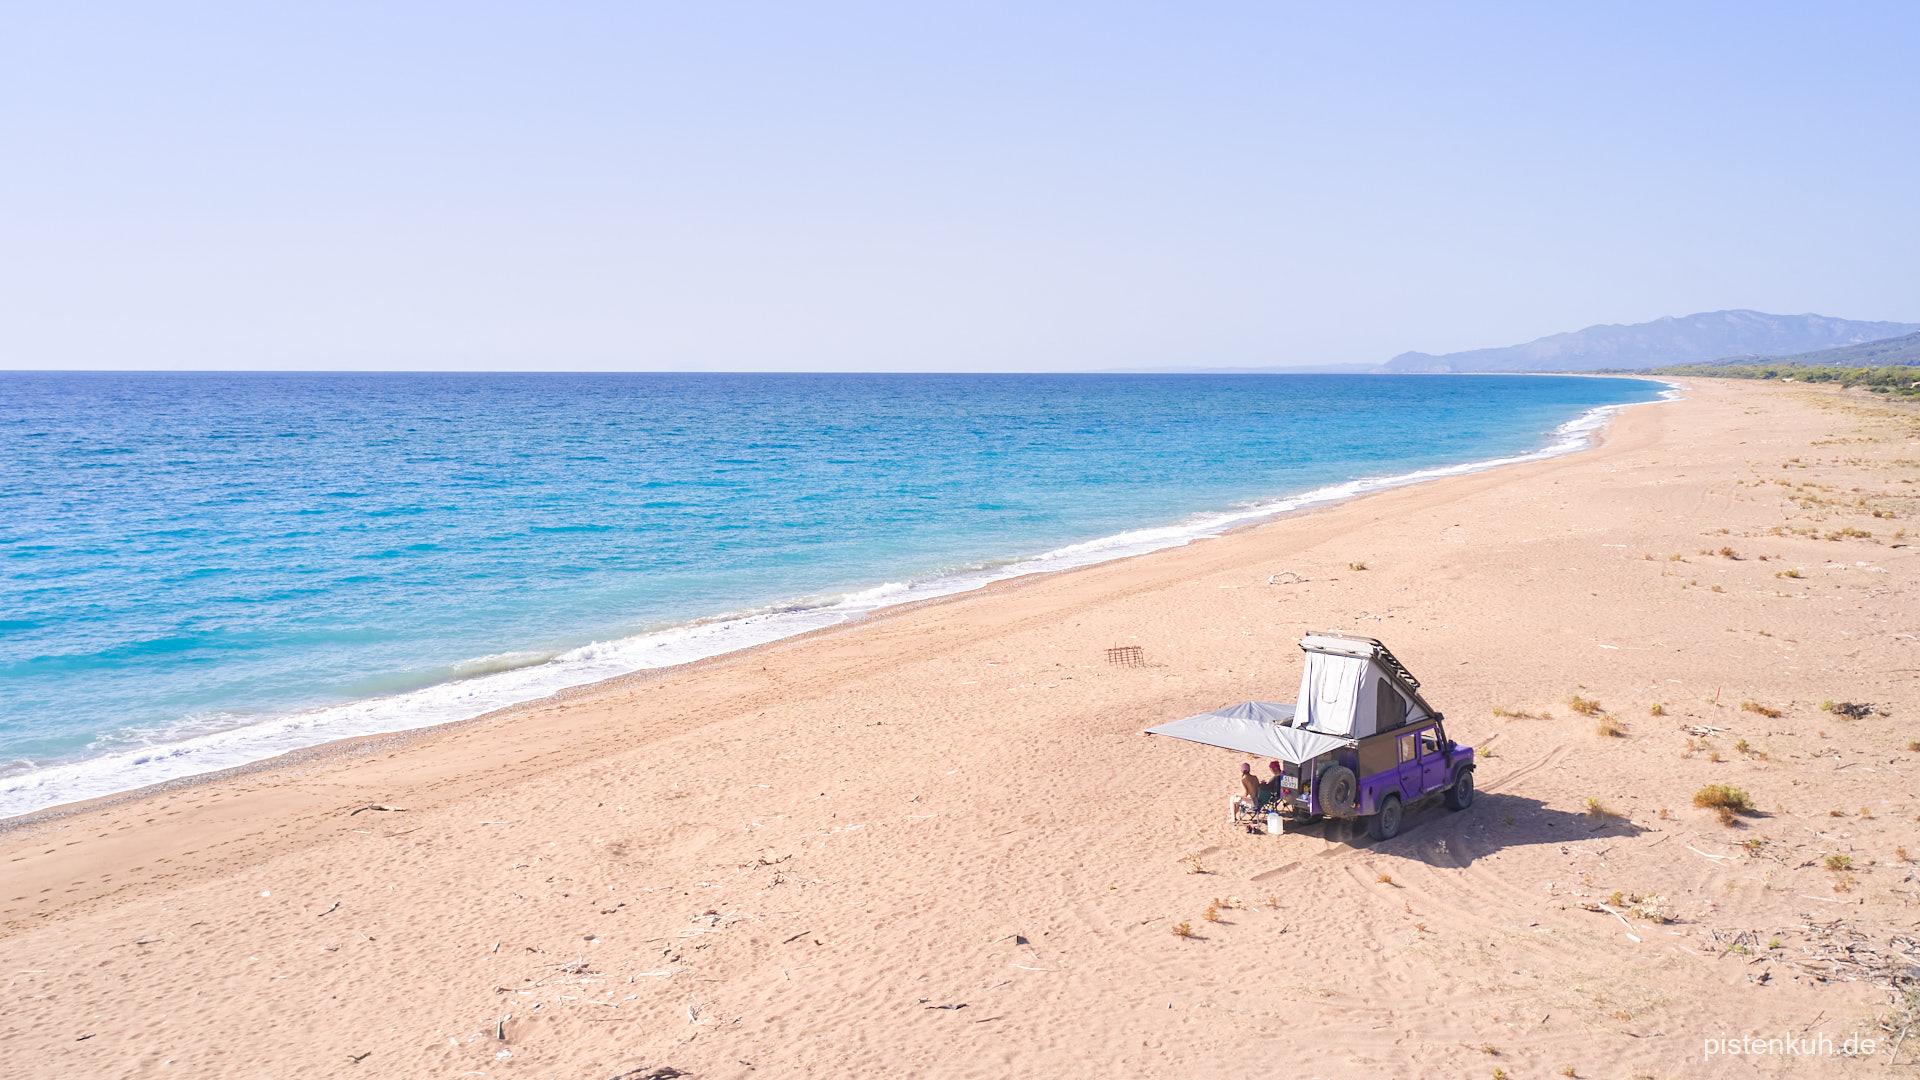 Freies Leben am Strand